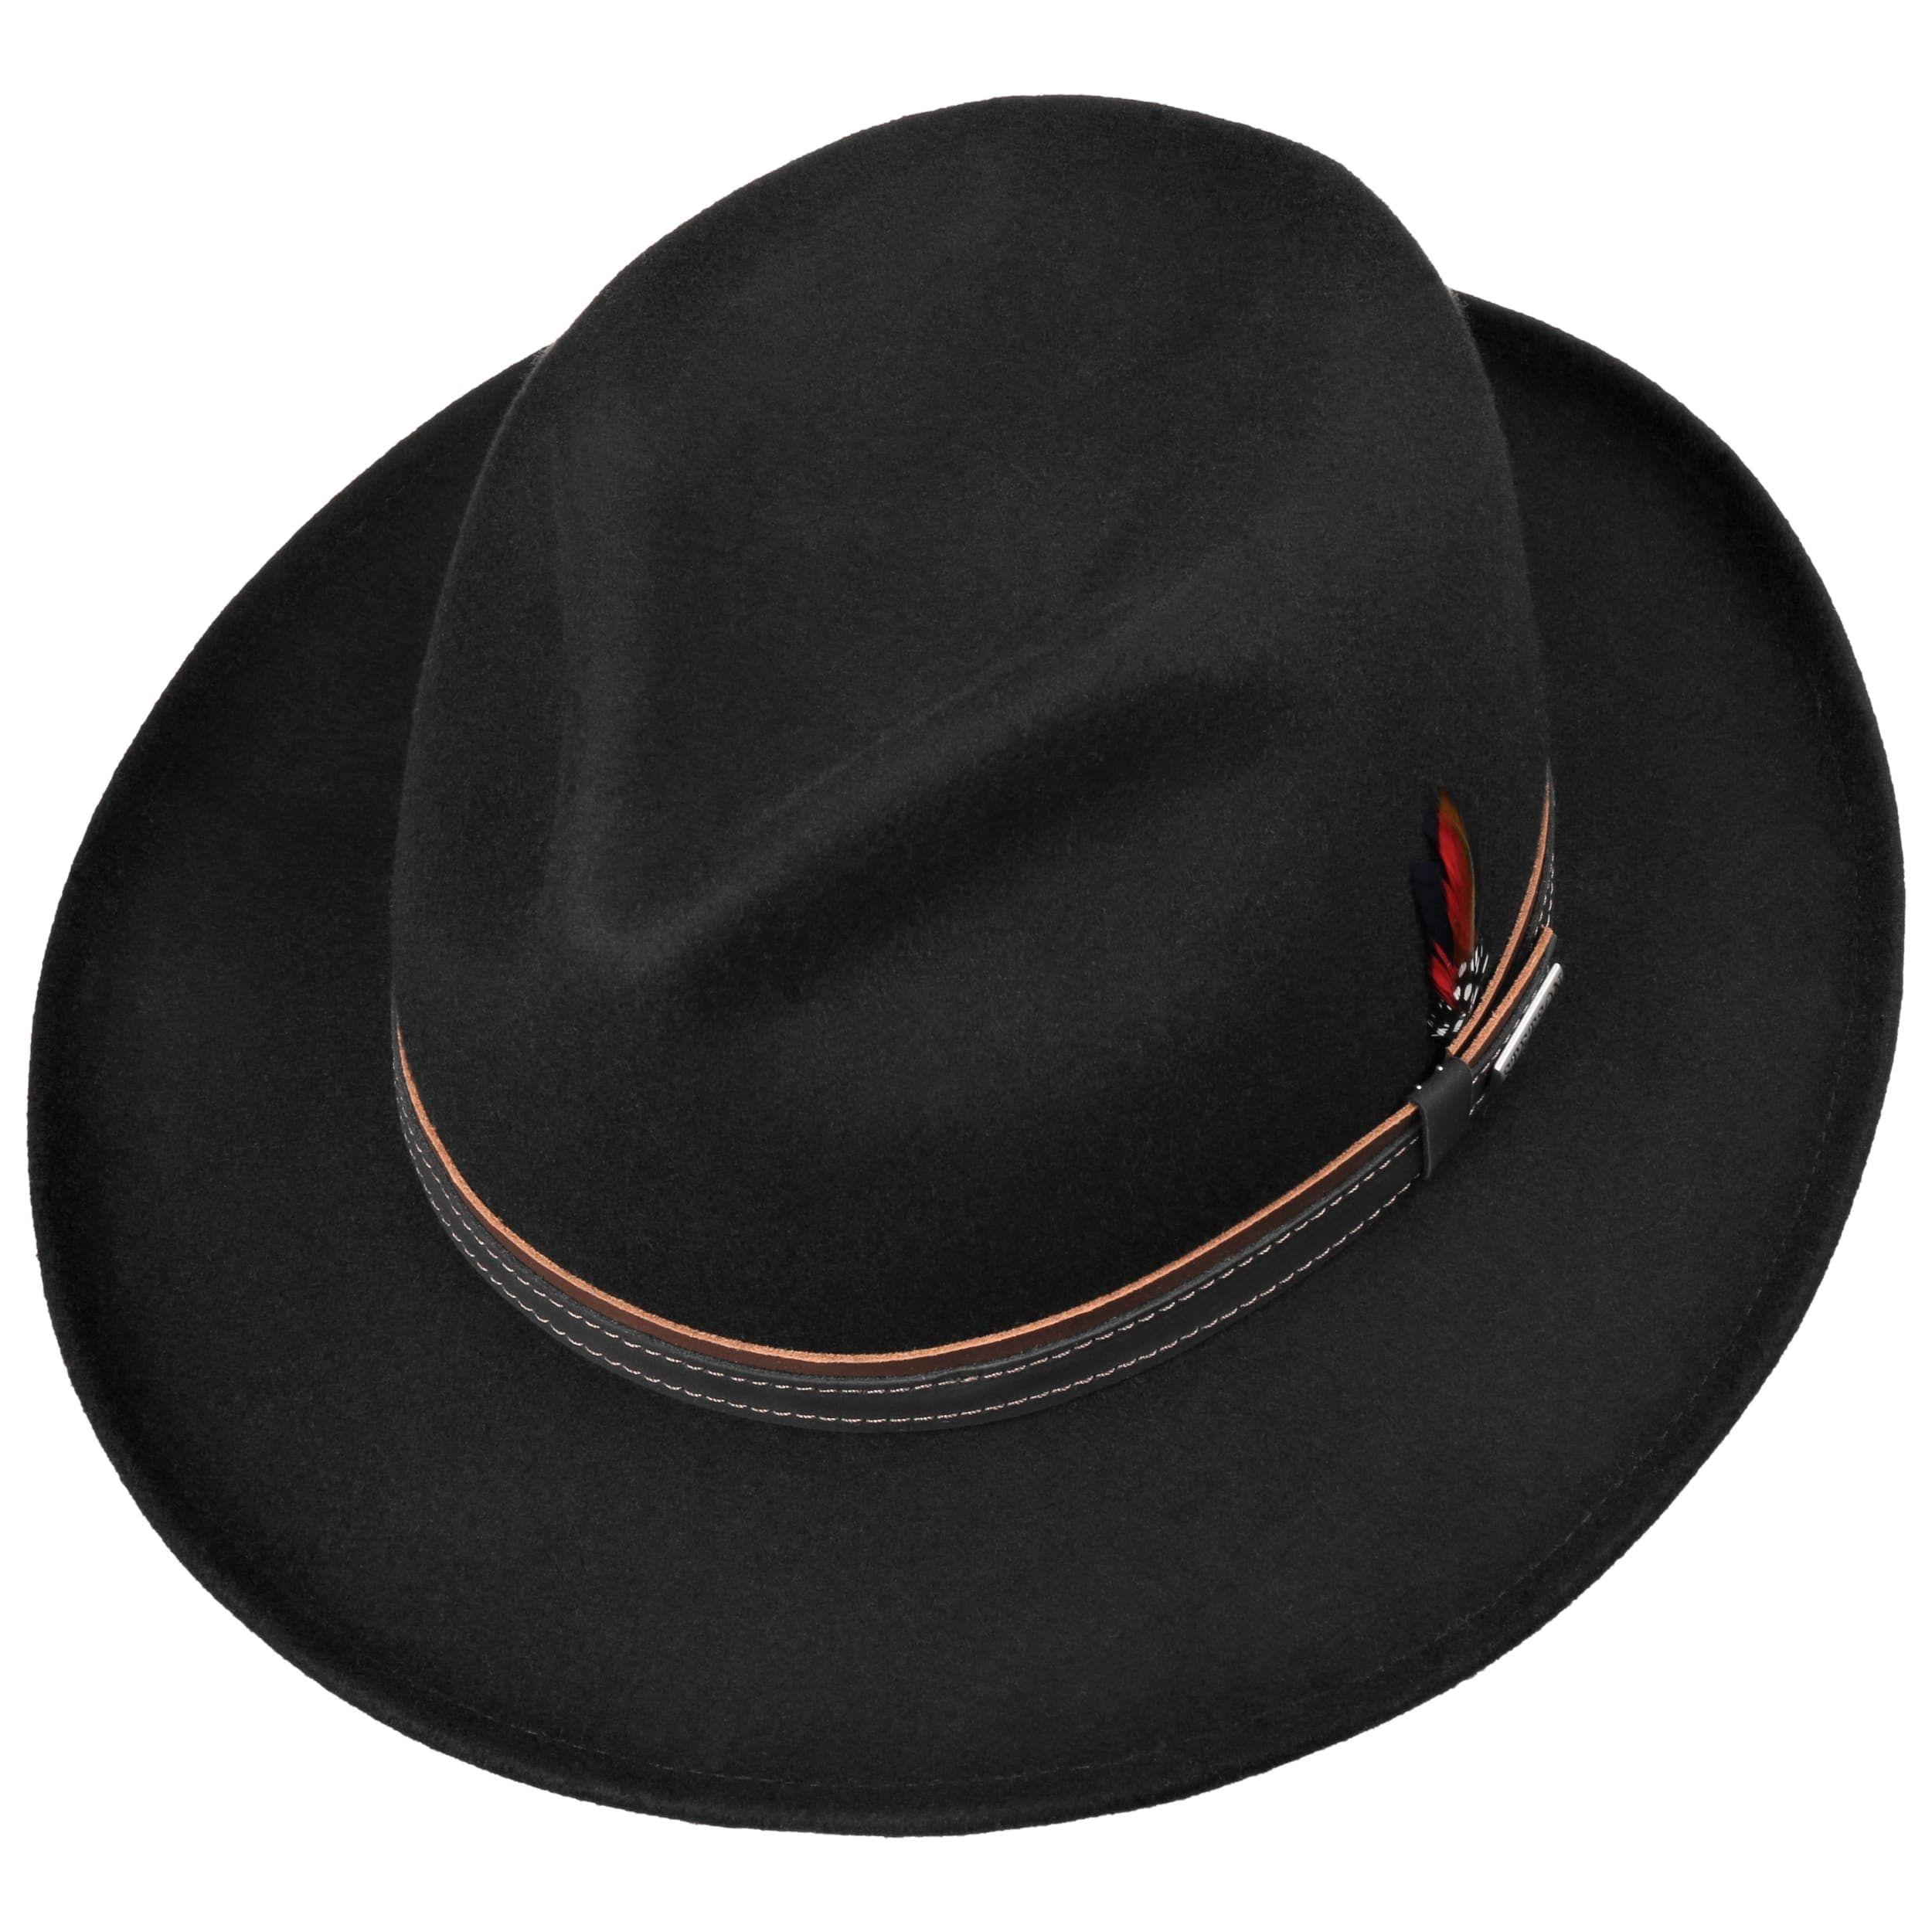 Darico Fedora Wool Felt Hat black